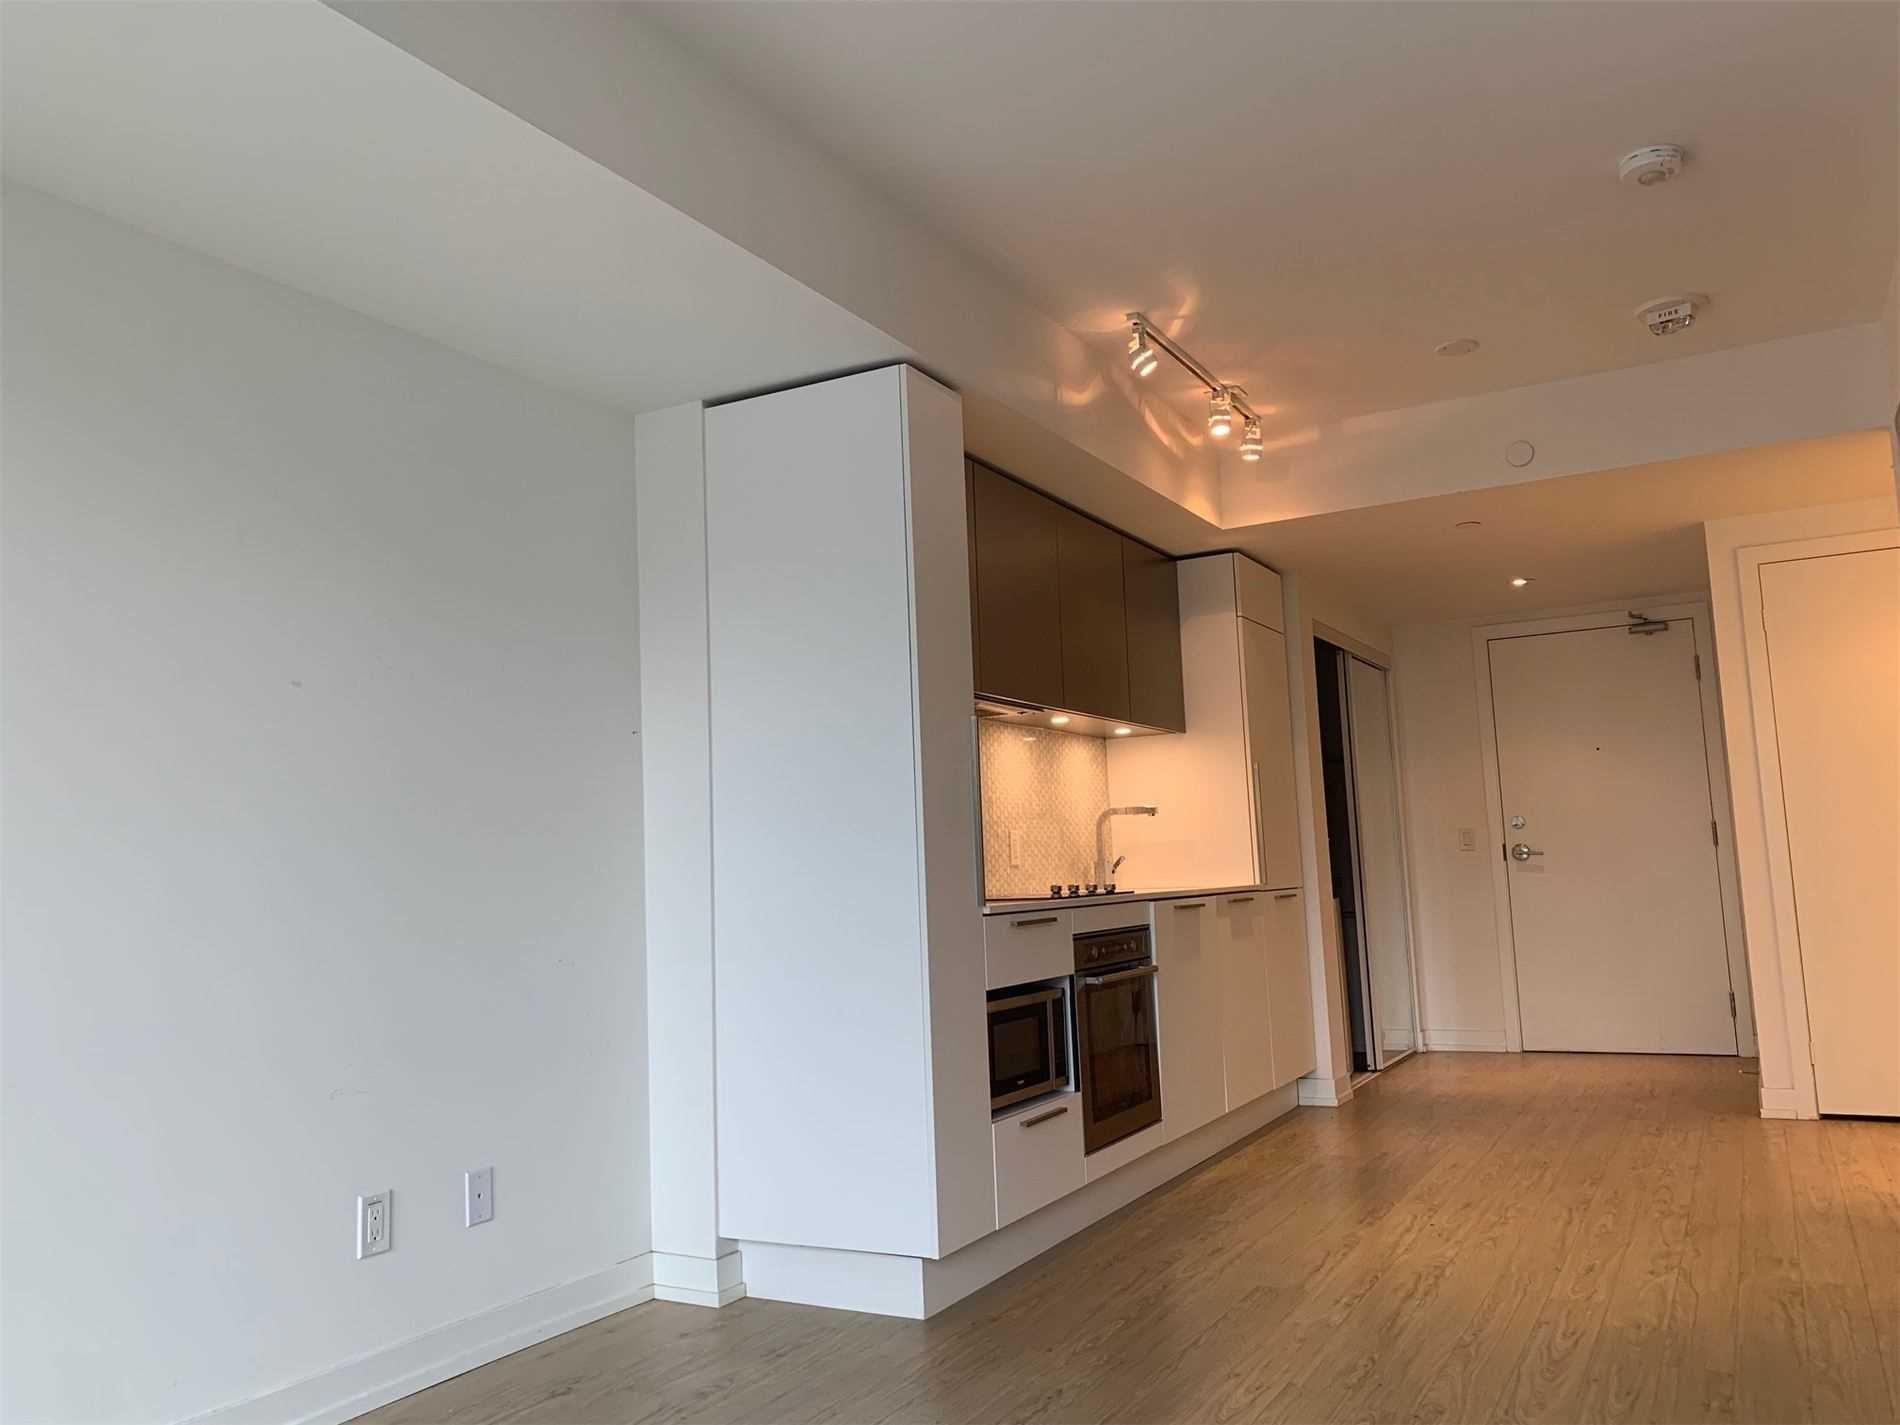 1001 - 85 Wood St - Church-Yonge Corridor Condo Apt for sale, 1 Bedroom (C5221011) - #9